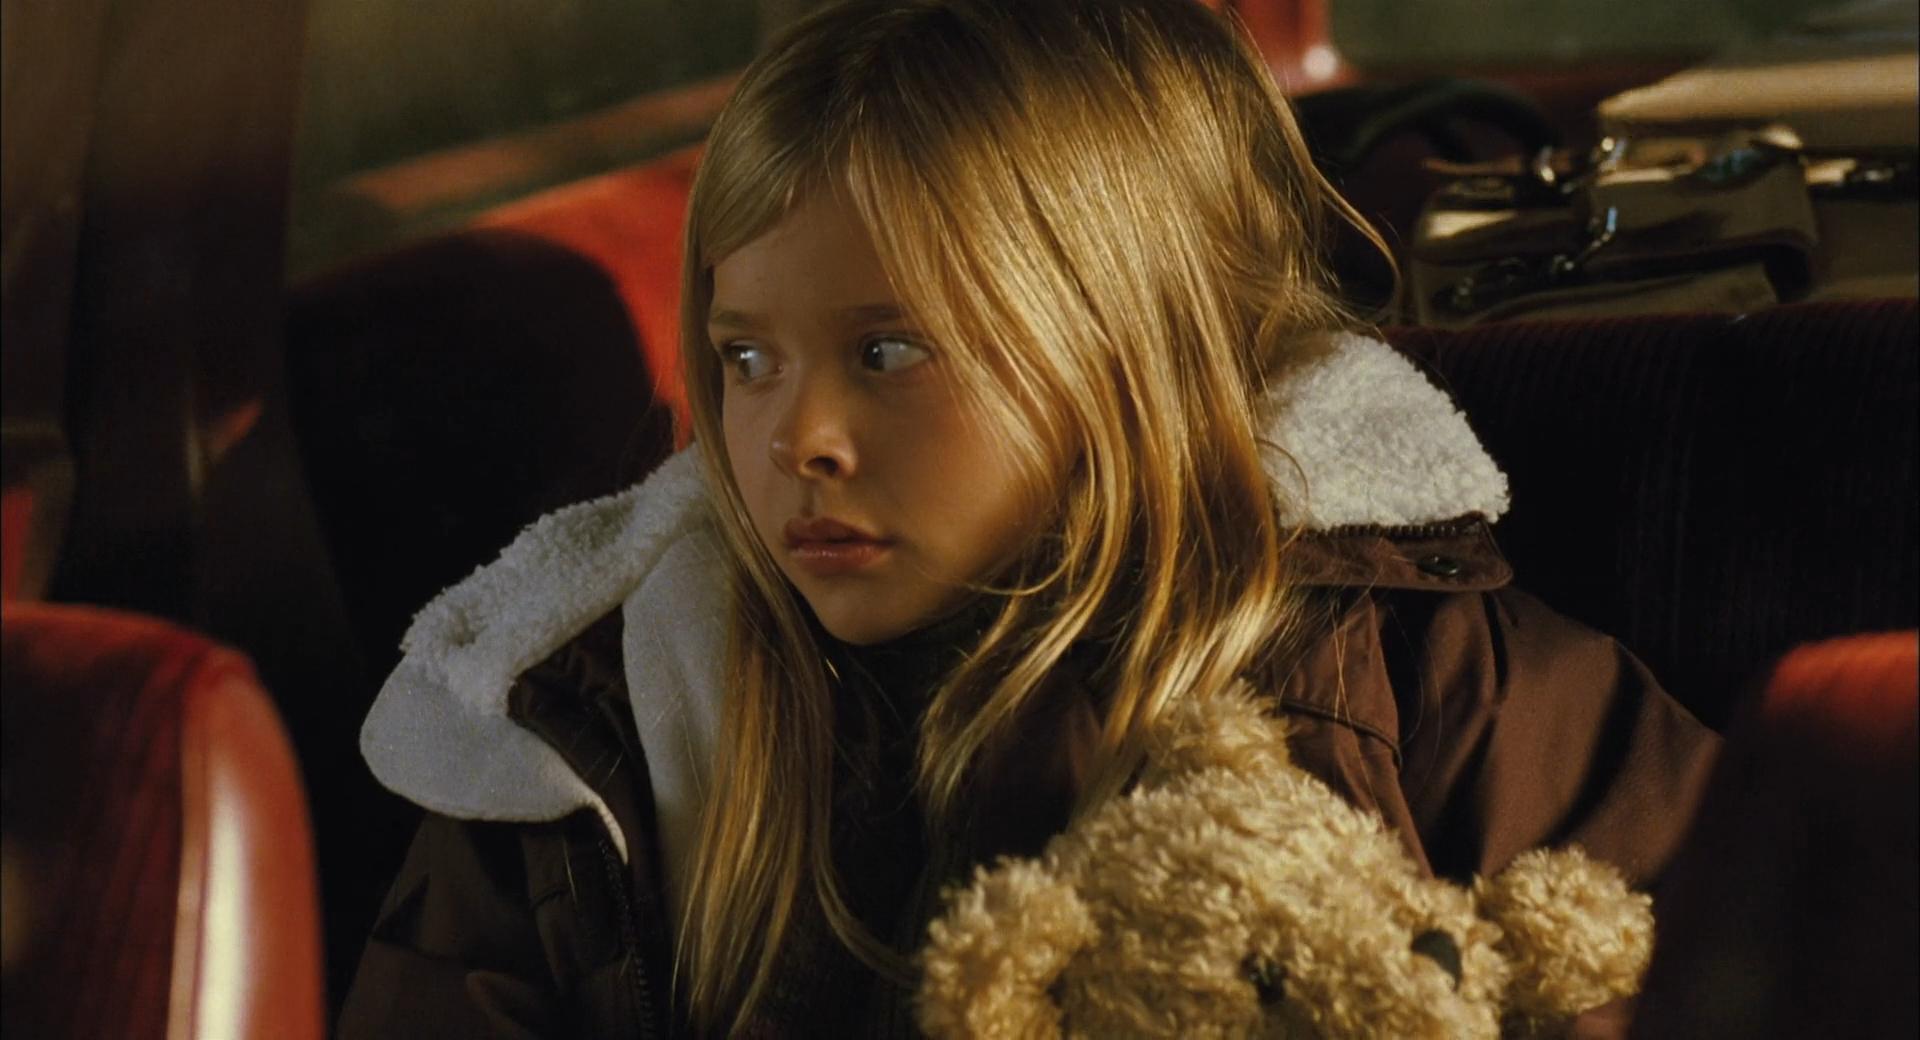 Dом Zомби / Wicked Little Things (2006) BDRip [H.264/1080p-LQ]